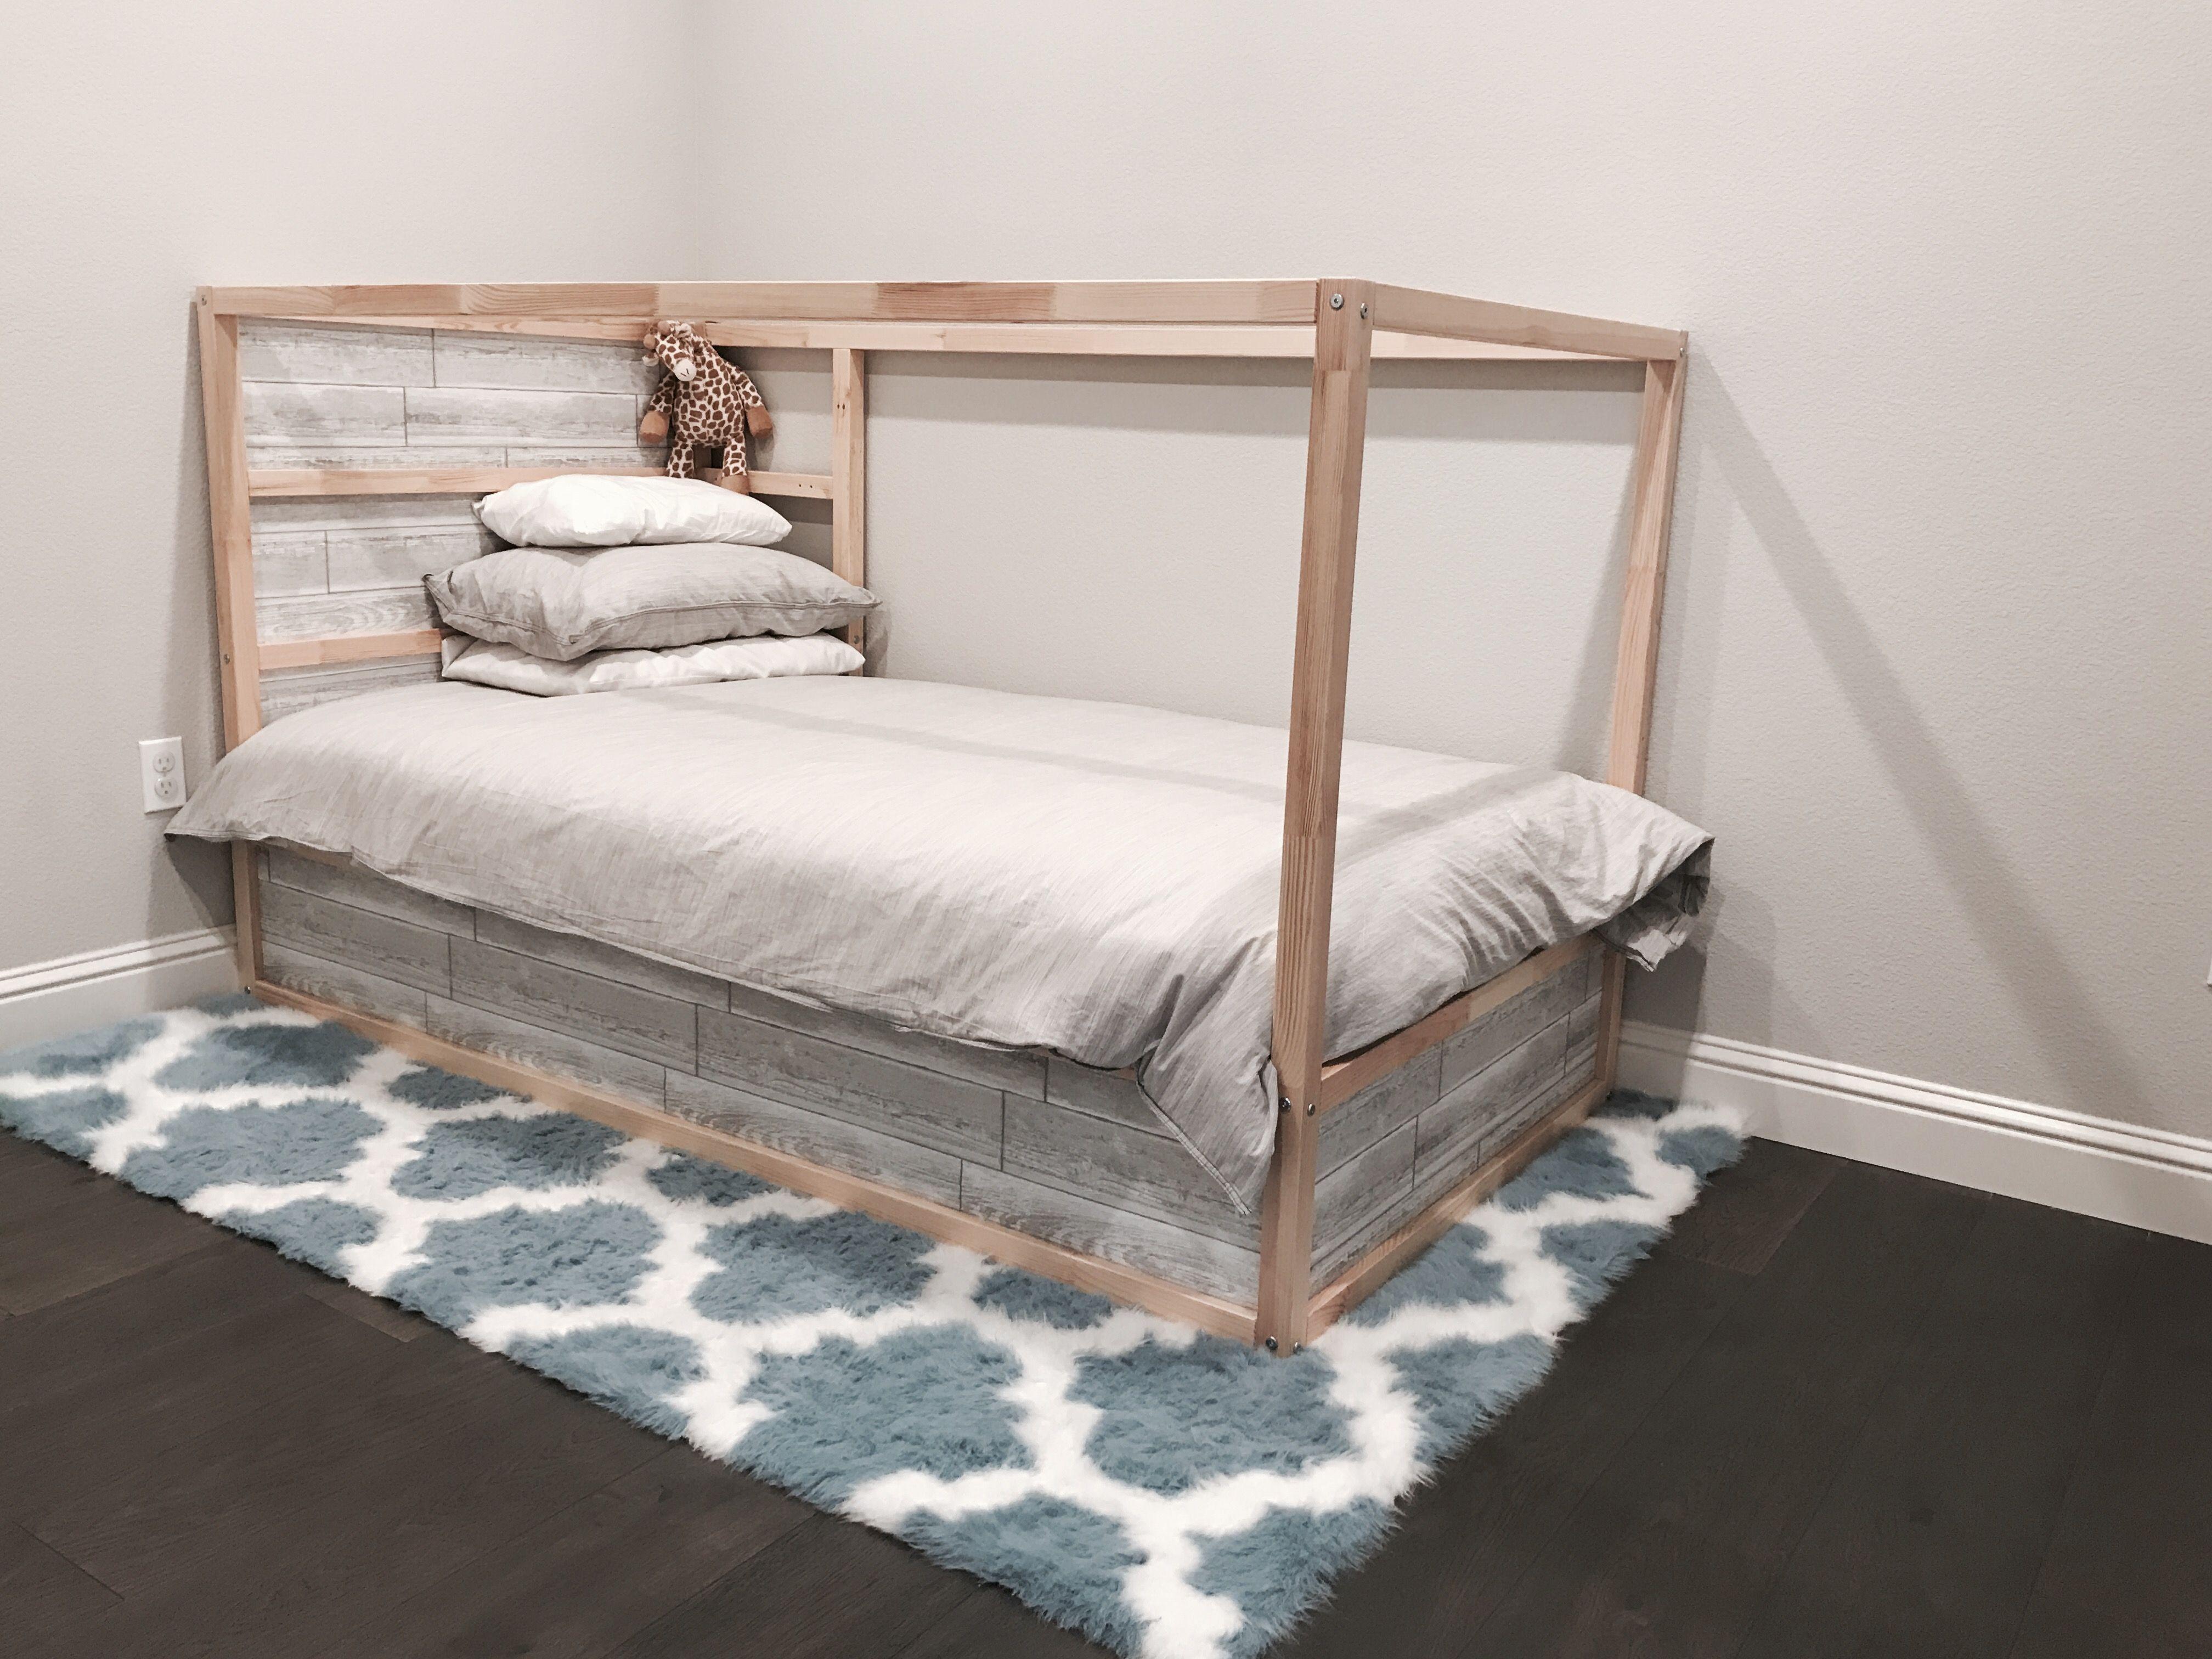 Best Ikea Kura Bed With White Grey Wood Plank Adhesive 640 x 480